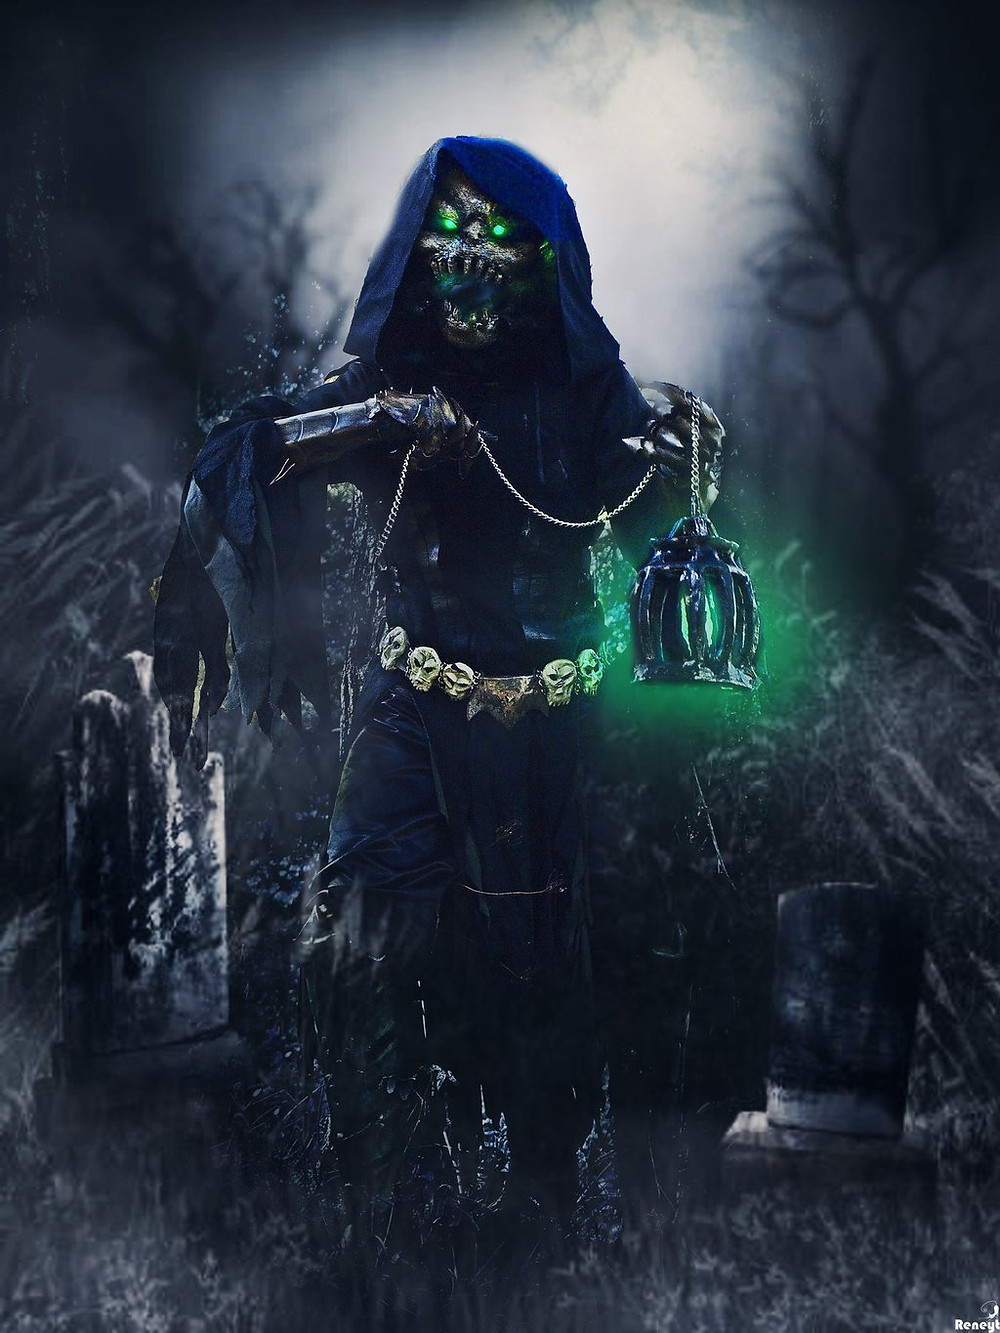 cosplay___thresh__the_chain_warden__by_svetliy_sudar-d80kyd2